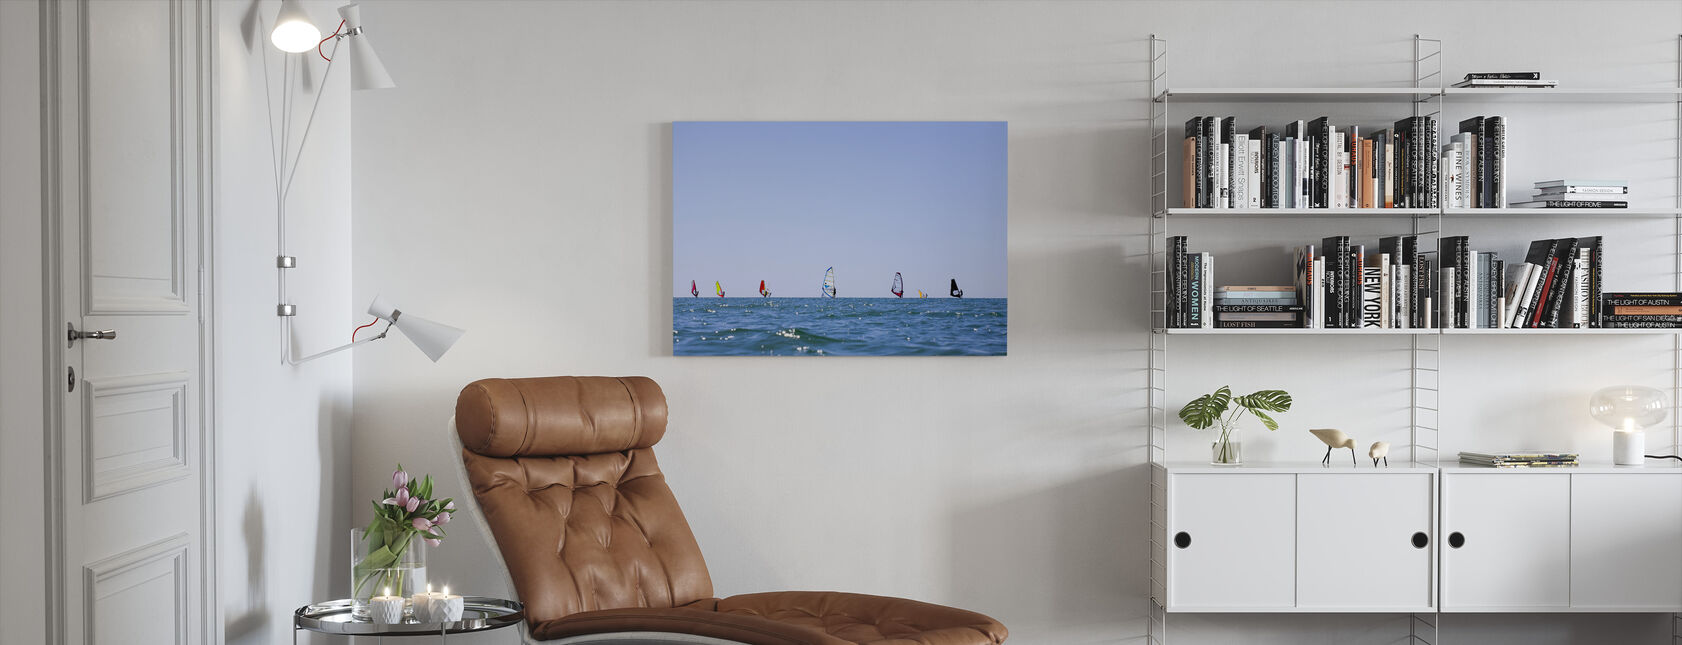 Windsurfing in Varberg, Sweden - Canvas print - Living Room